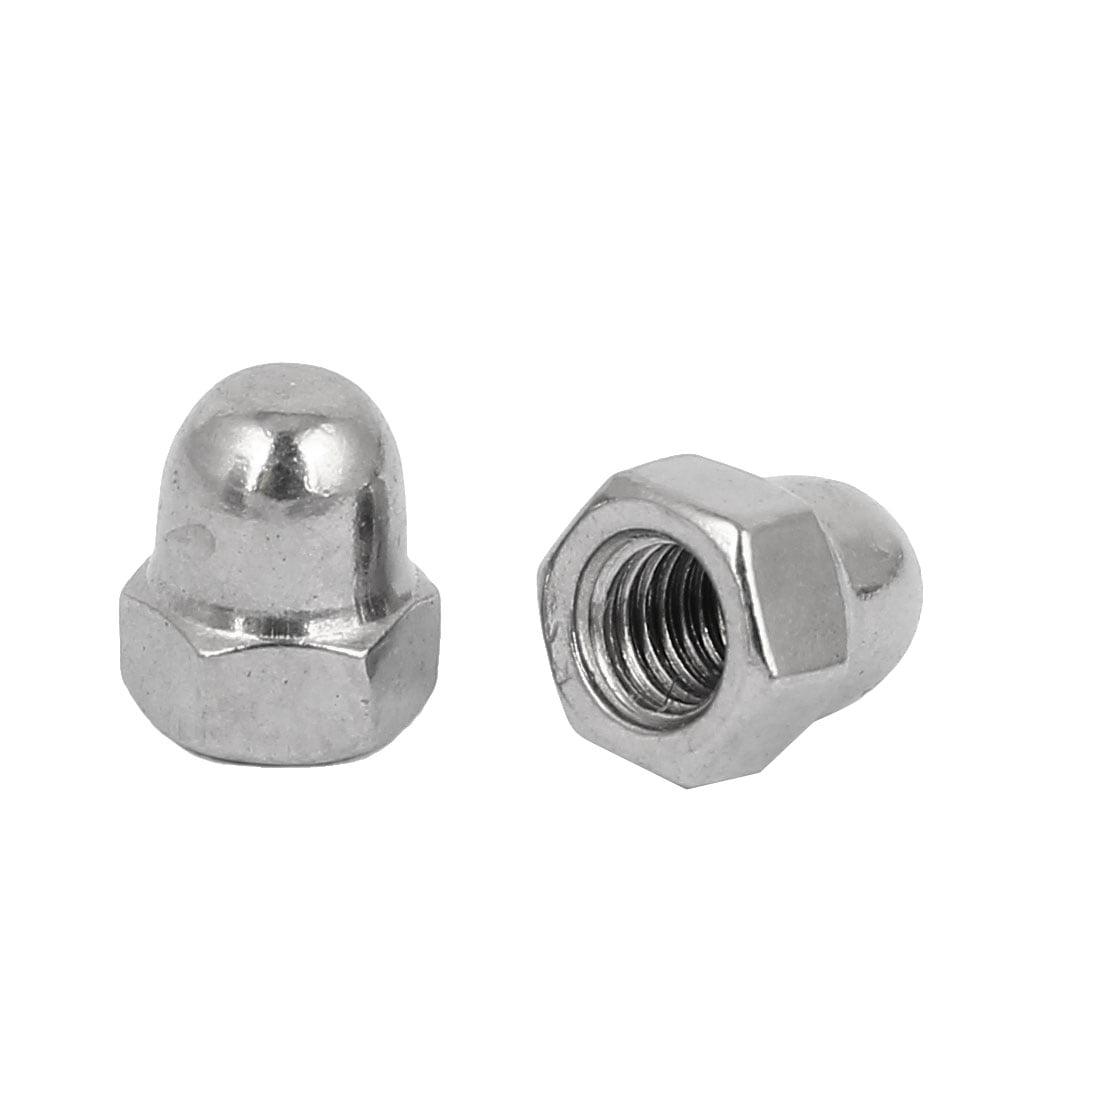 M5 Thread Dia 304 Stainless Steel Dome Shape Head Cap Acorn Hex Nut 25pcs - image 1 of 2